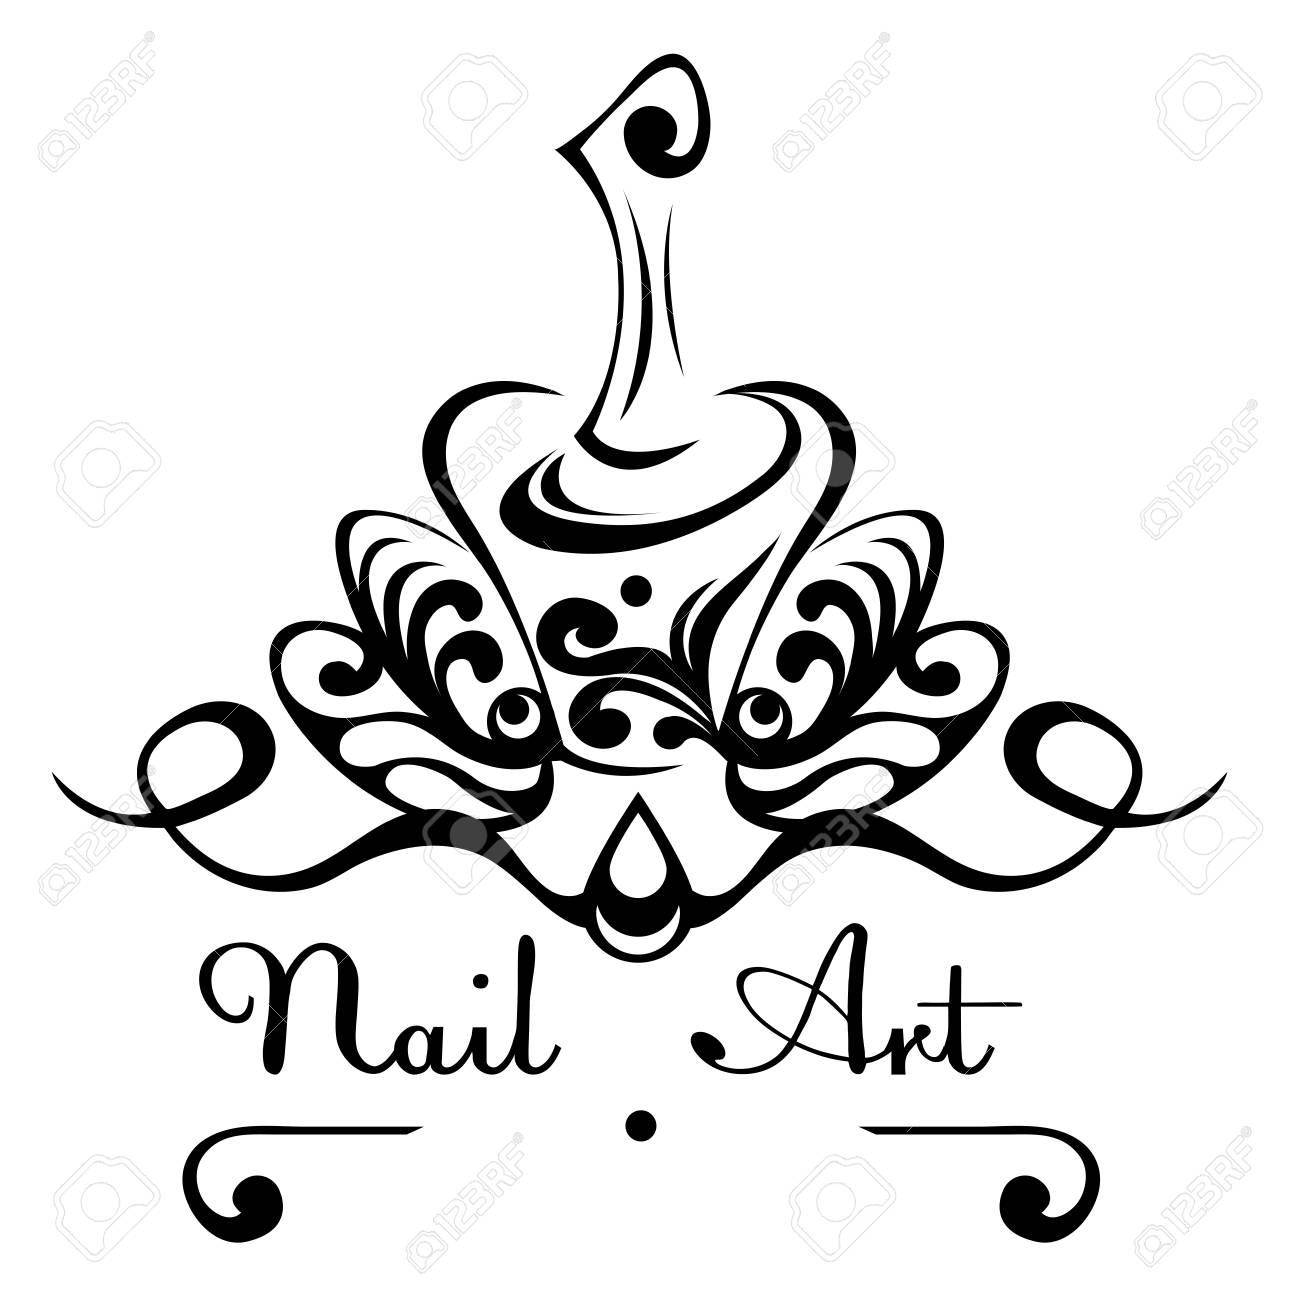 Bottle Of Nail Polish Clip Art | Hession Hairdressing